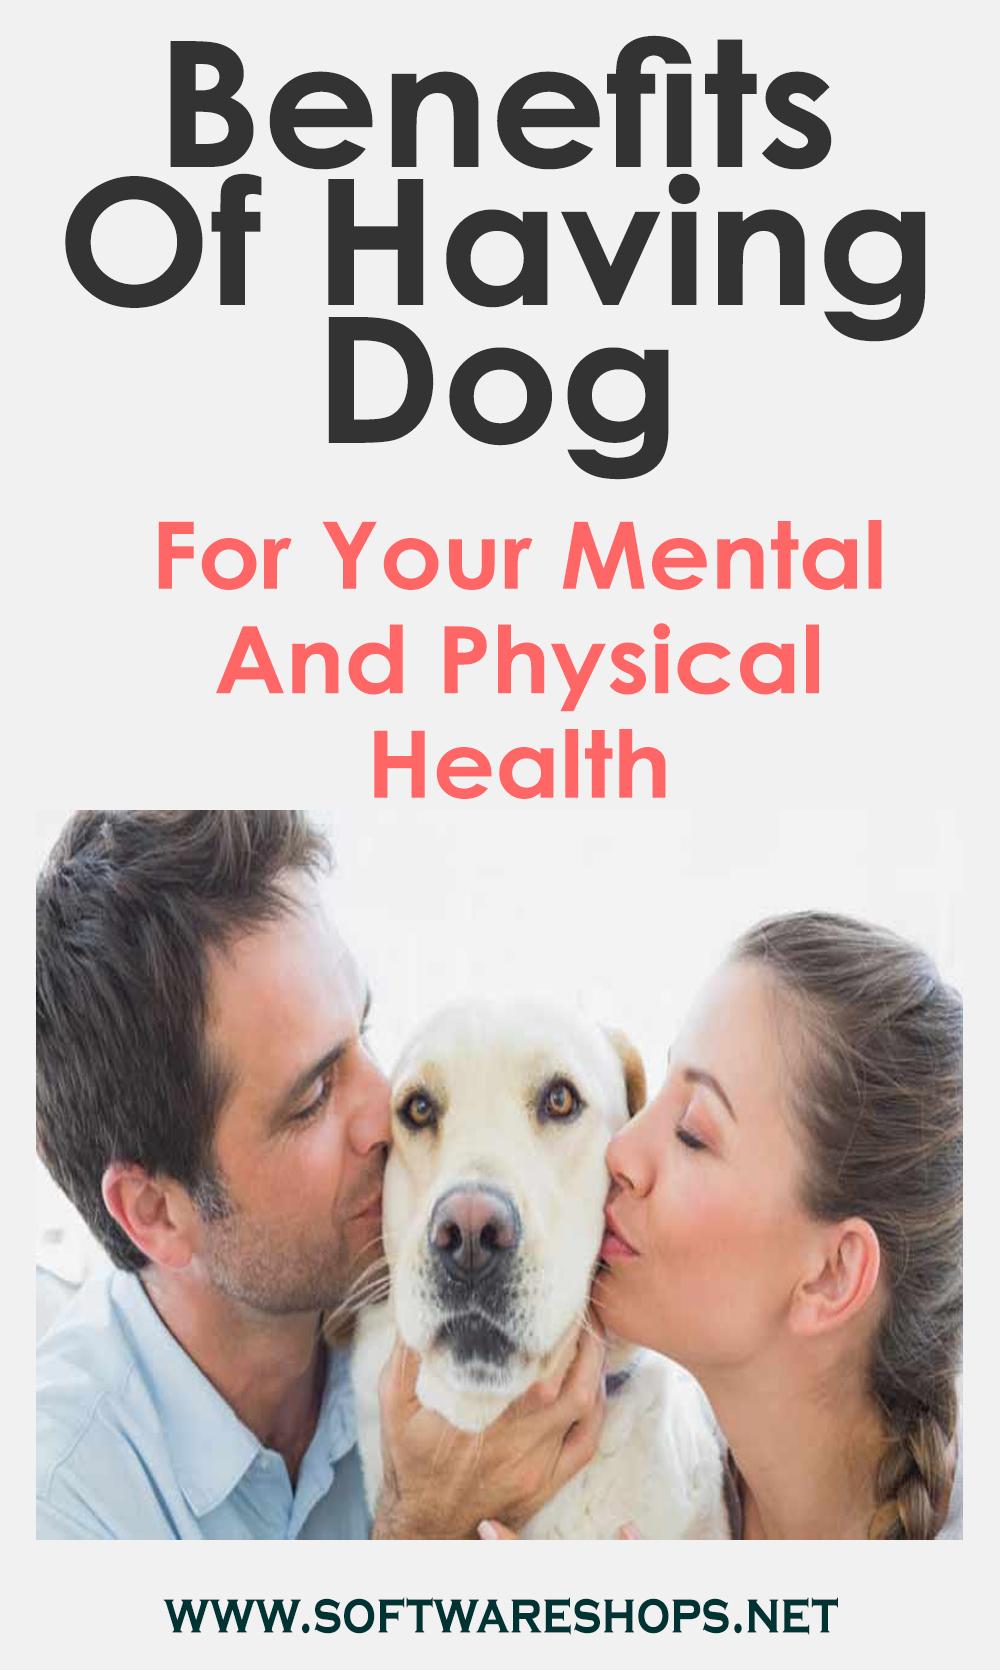 Benefits Of Having Dog